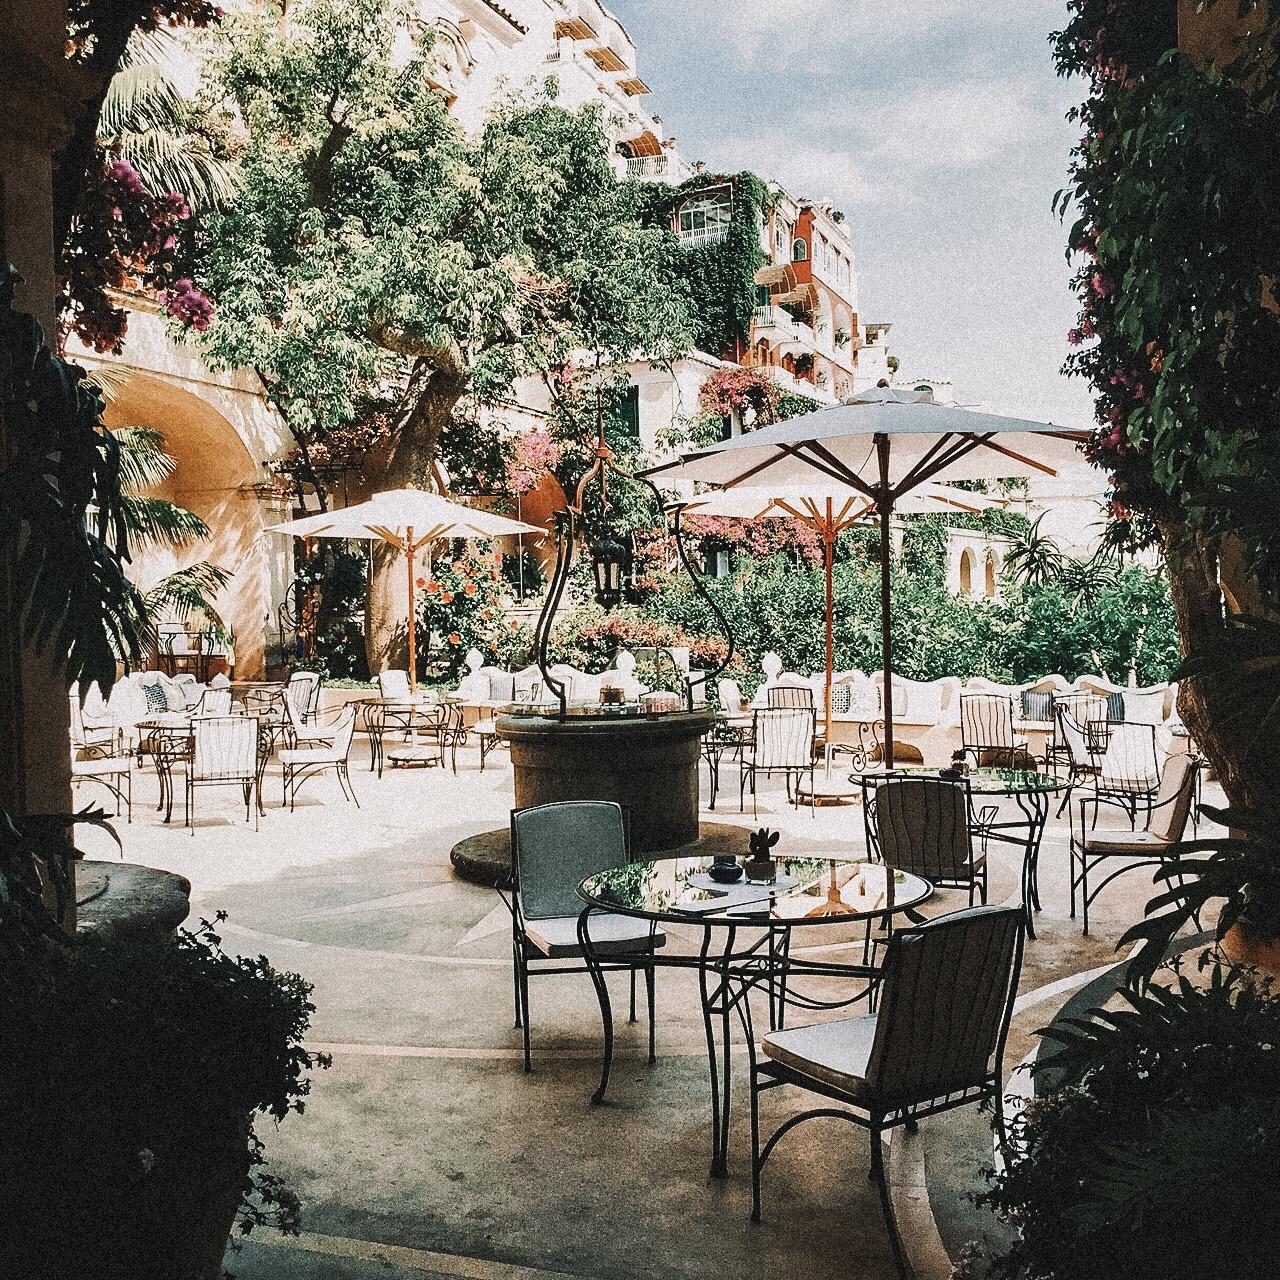 Italy, Positano